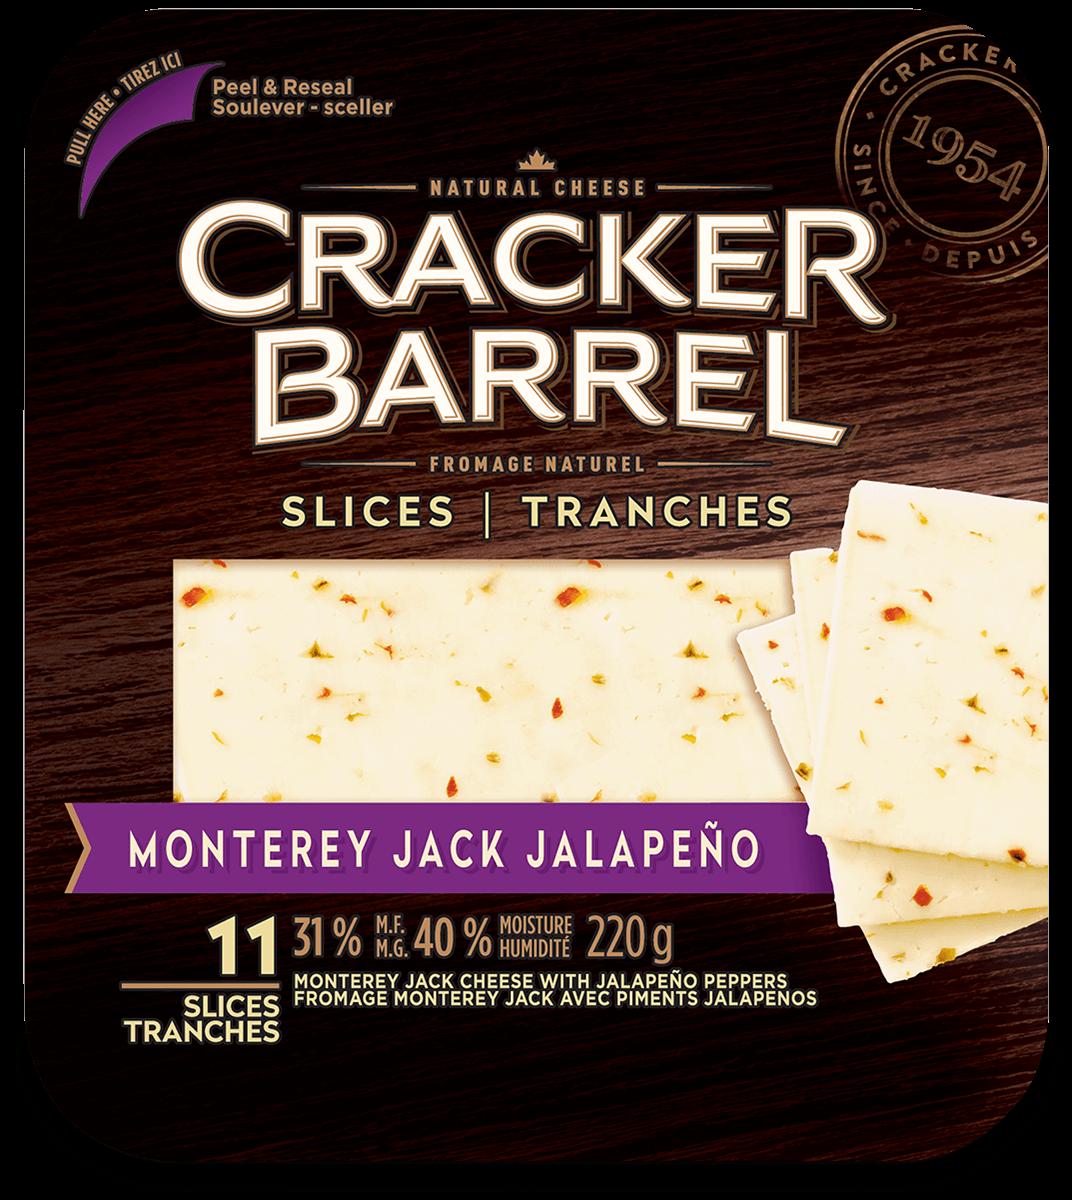 Cracker Barrel Cheese Slices - Monterey Jack With Jalapeño Pepper - 11 Slices - 220 g